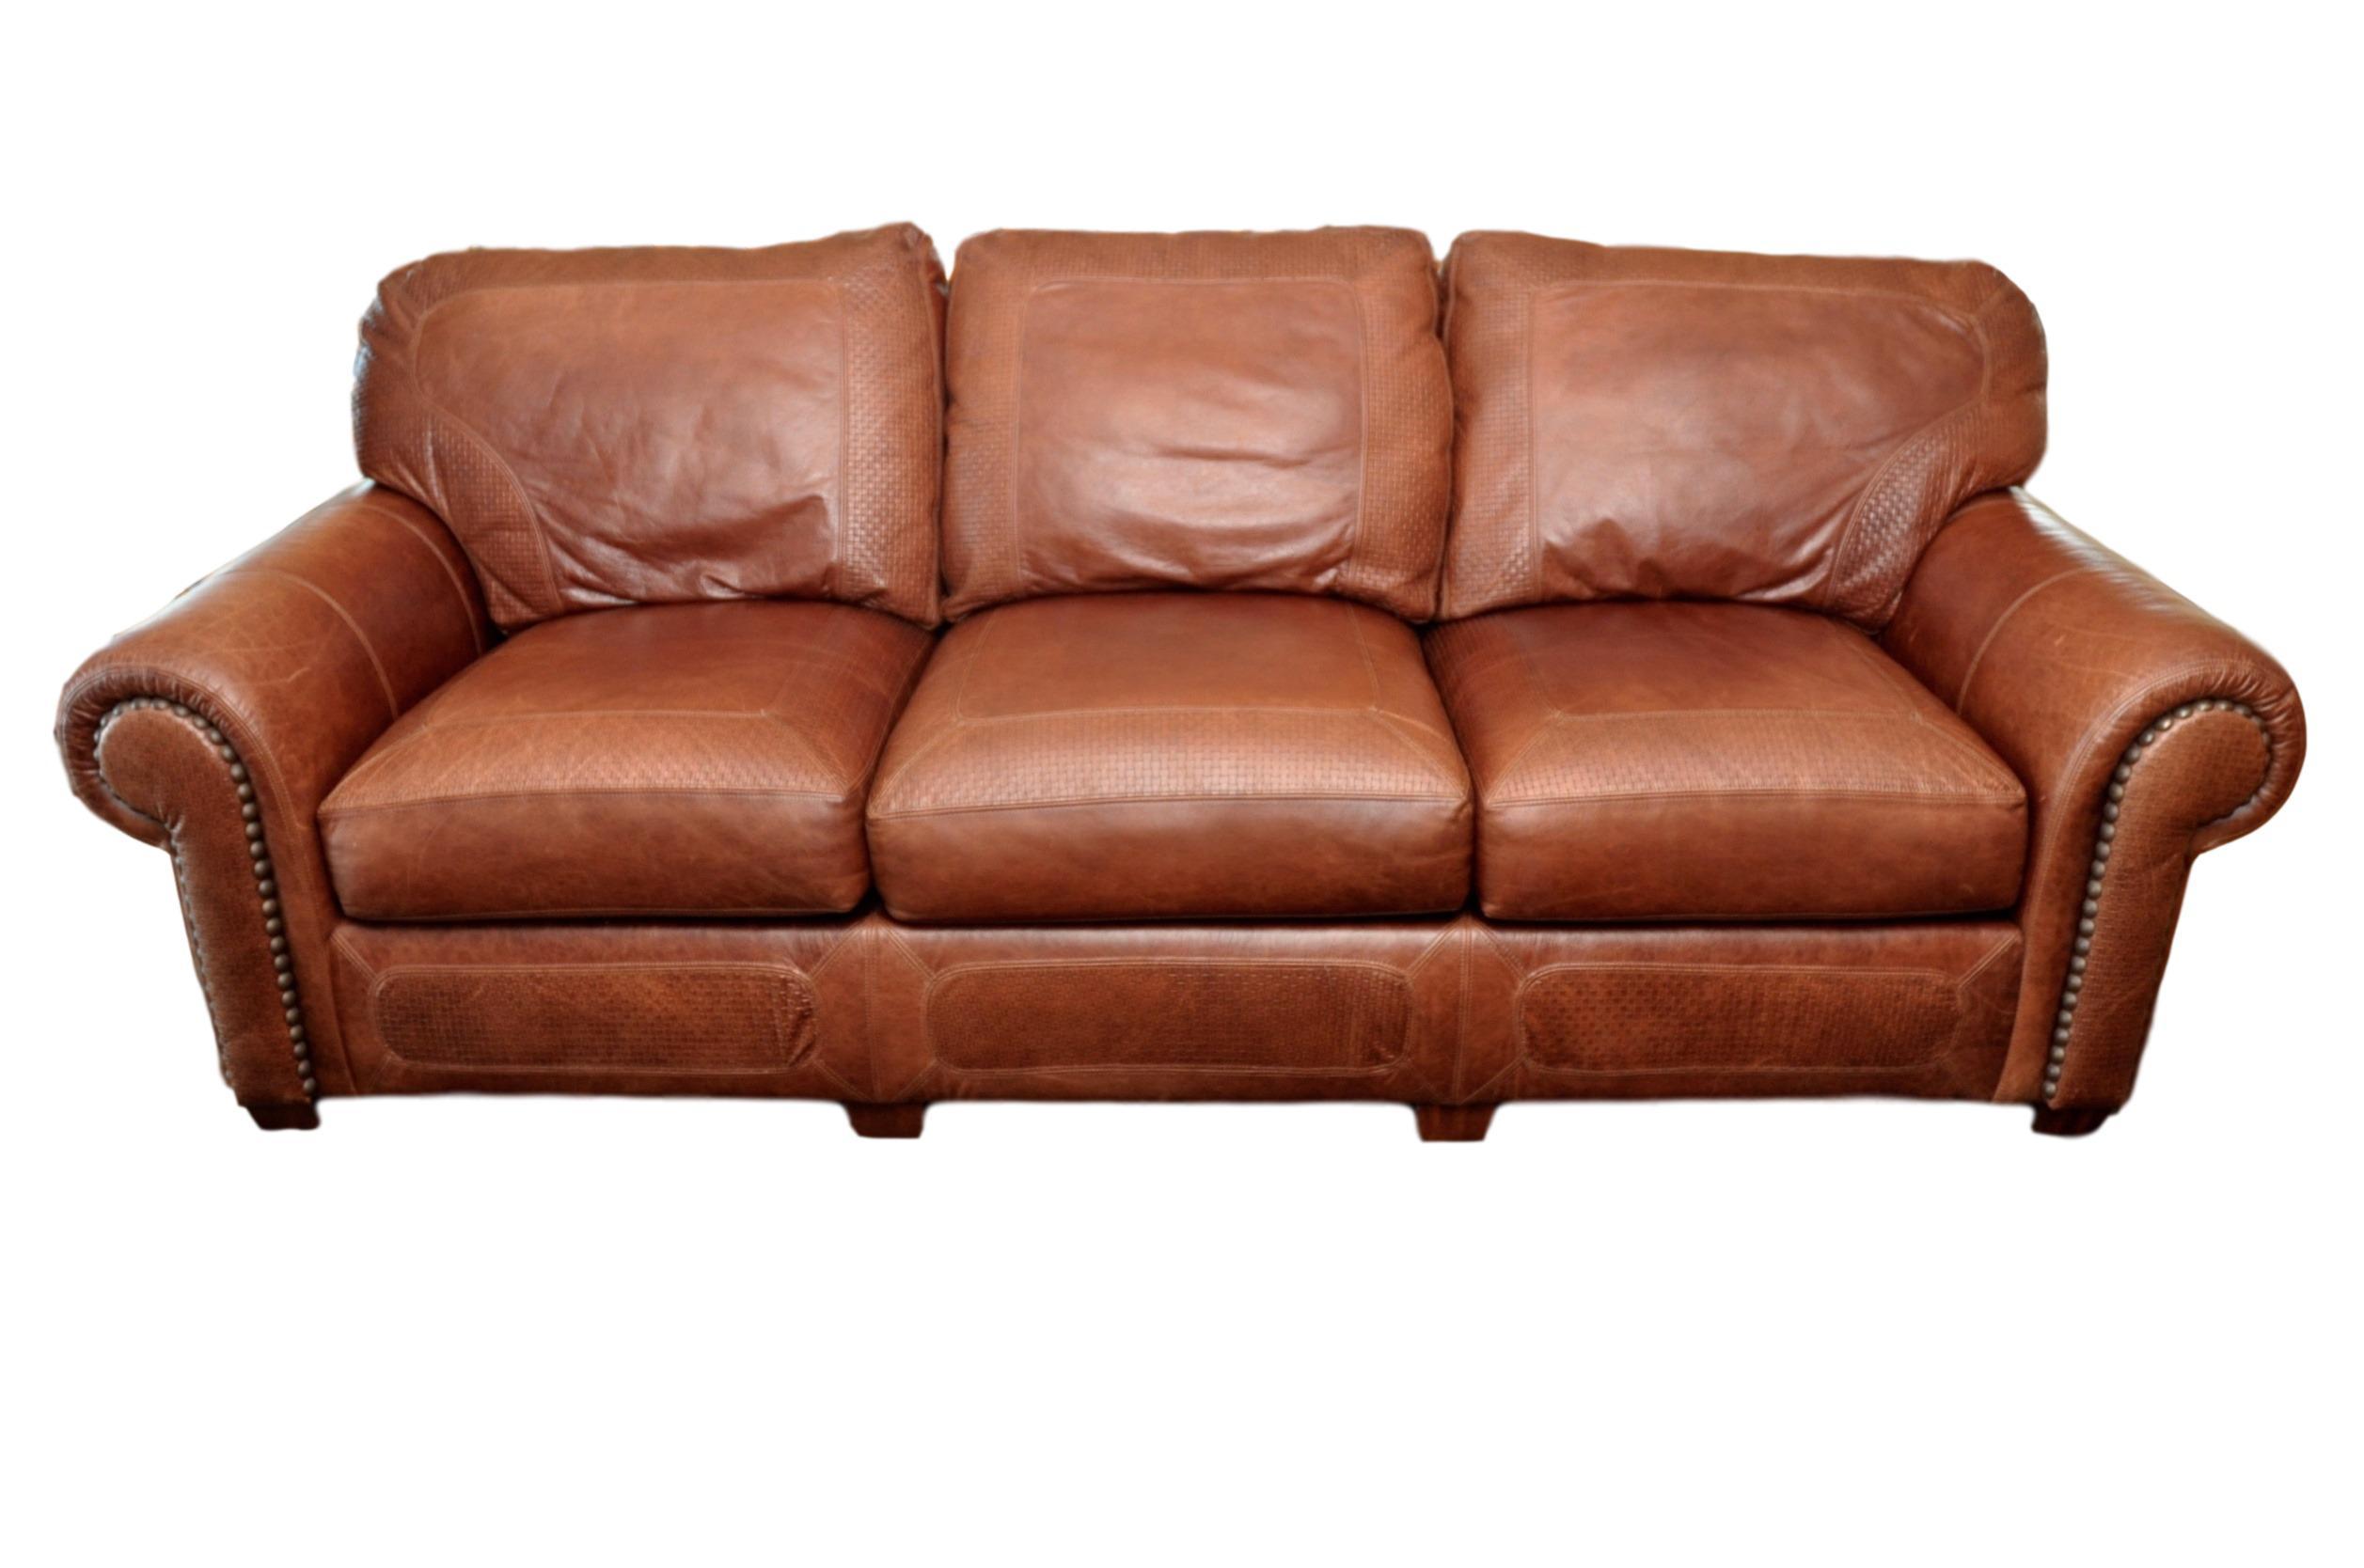 Stickley Cibola Internationale Santa Fe Style Leather Sofa For Sale